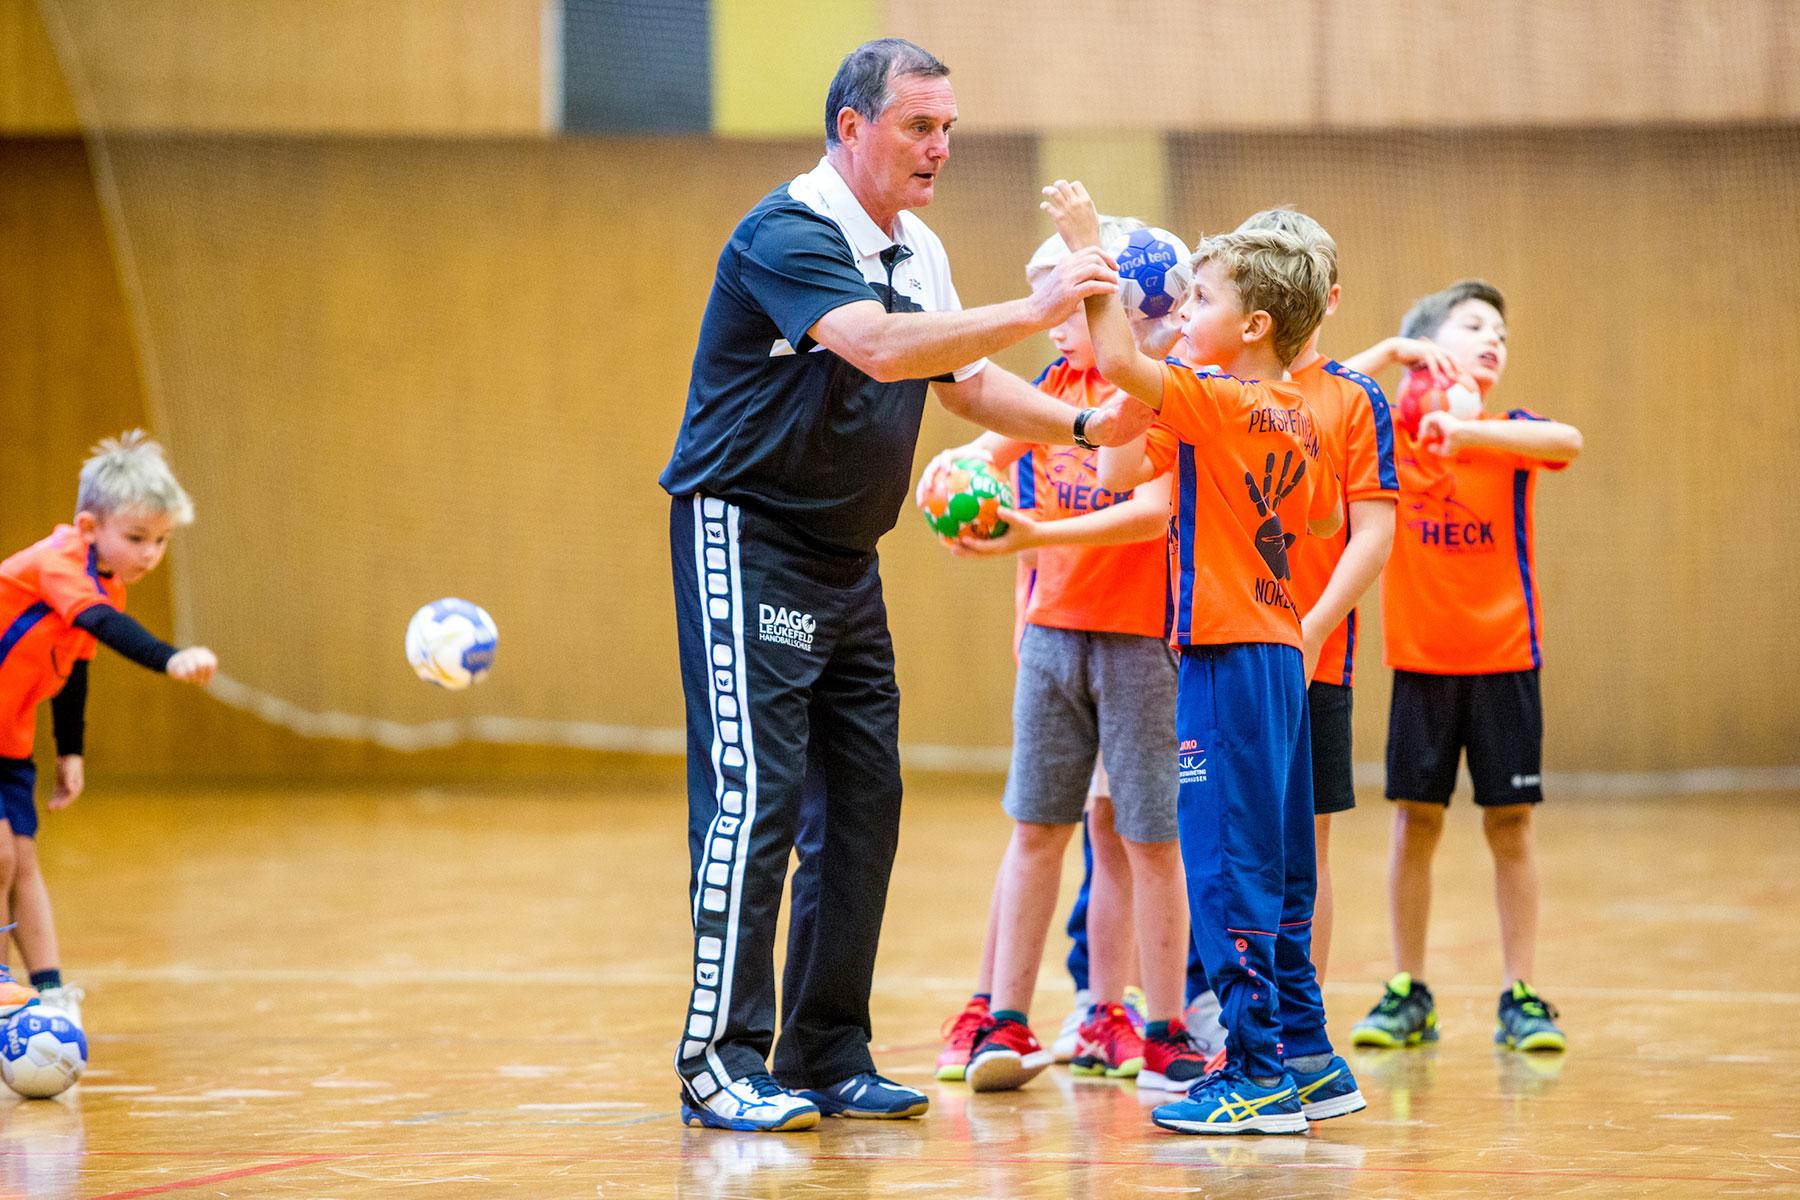 201809_Handballcamp_NDH (4)